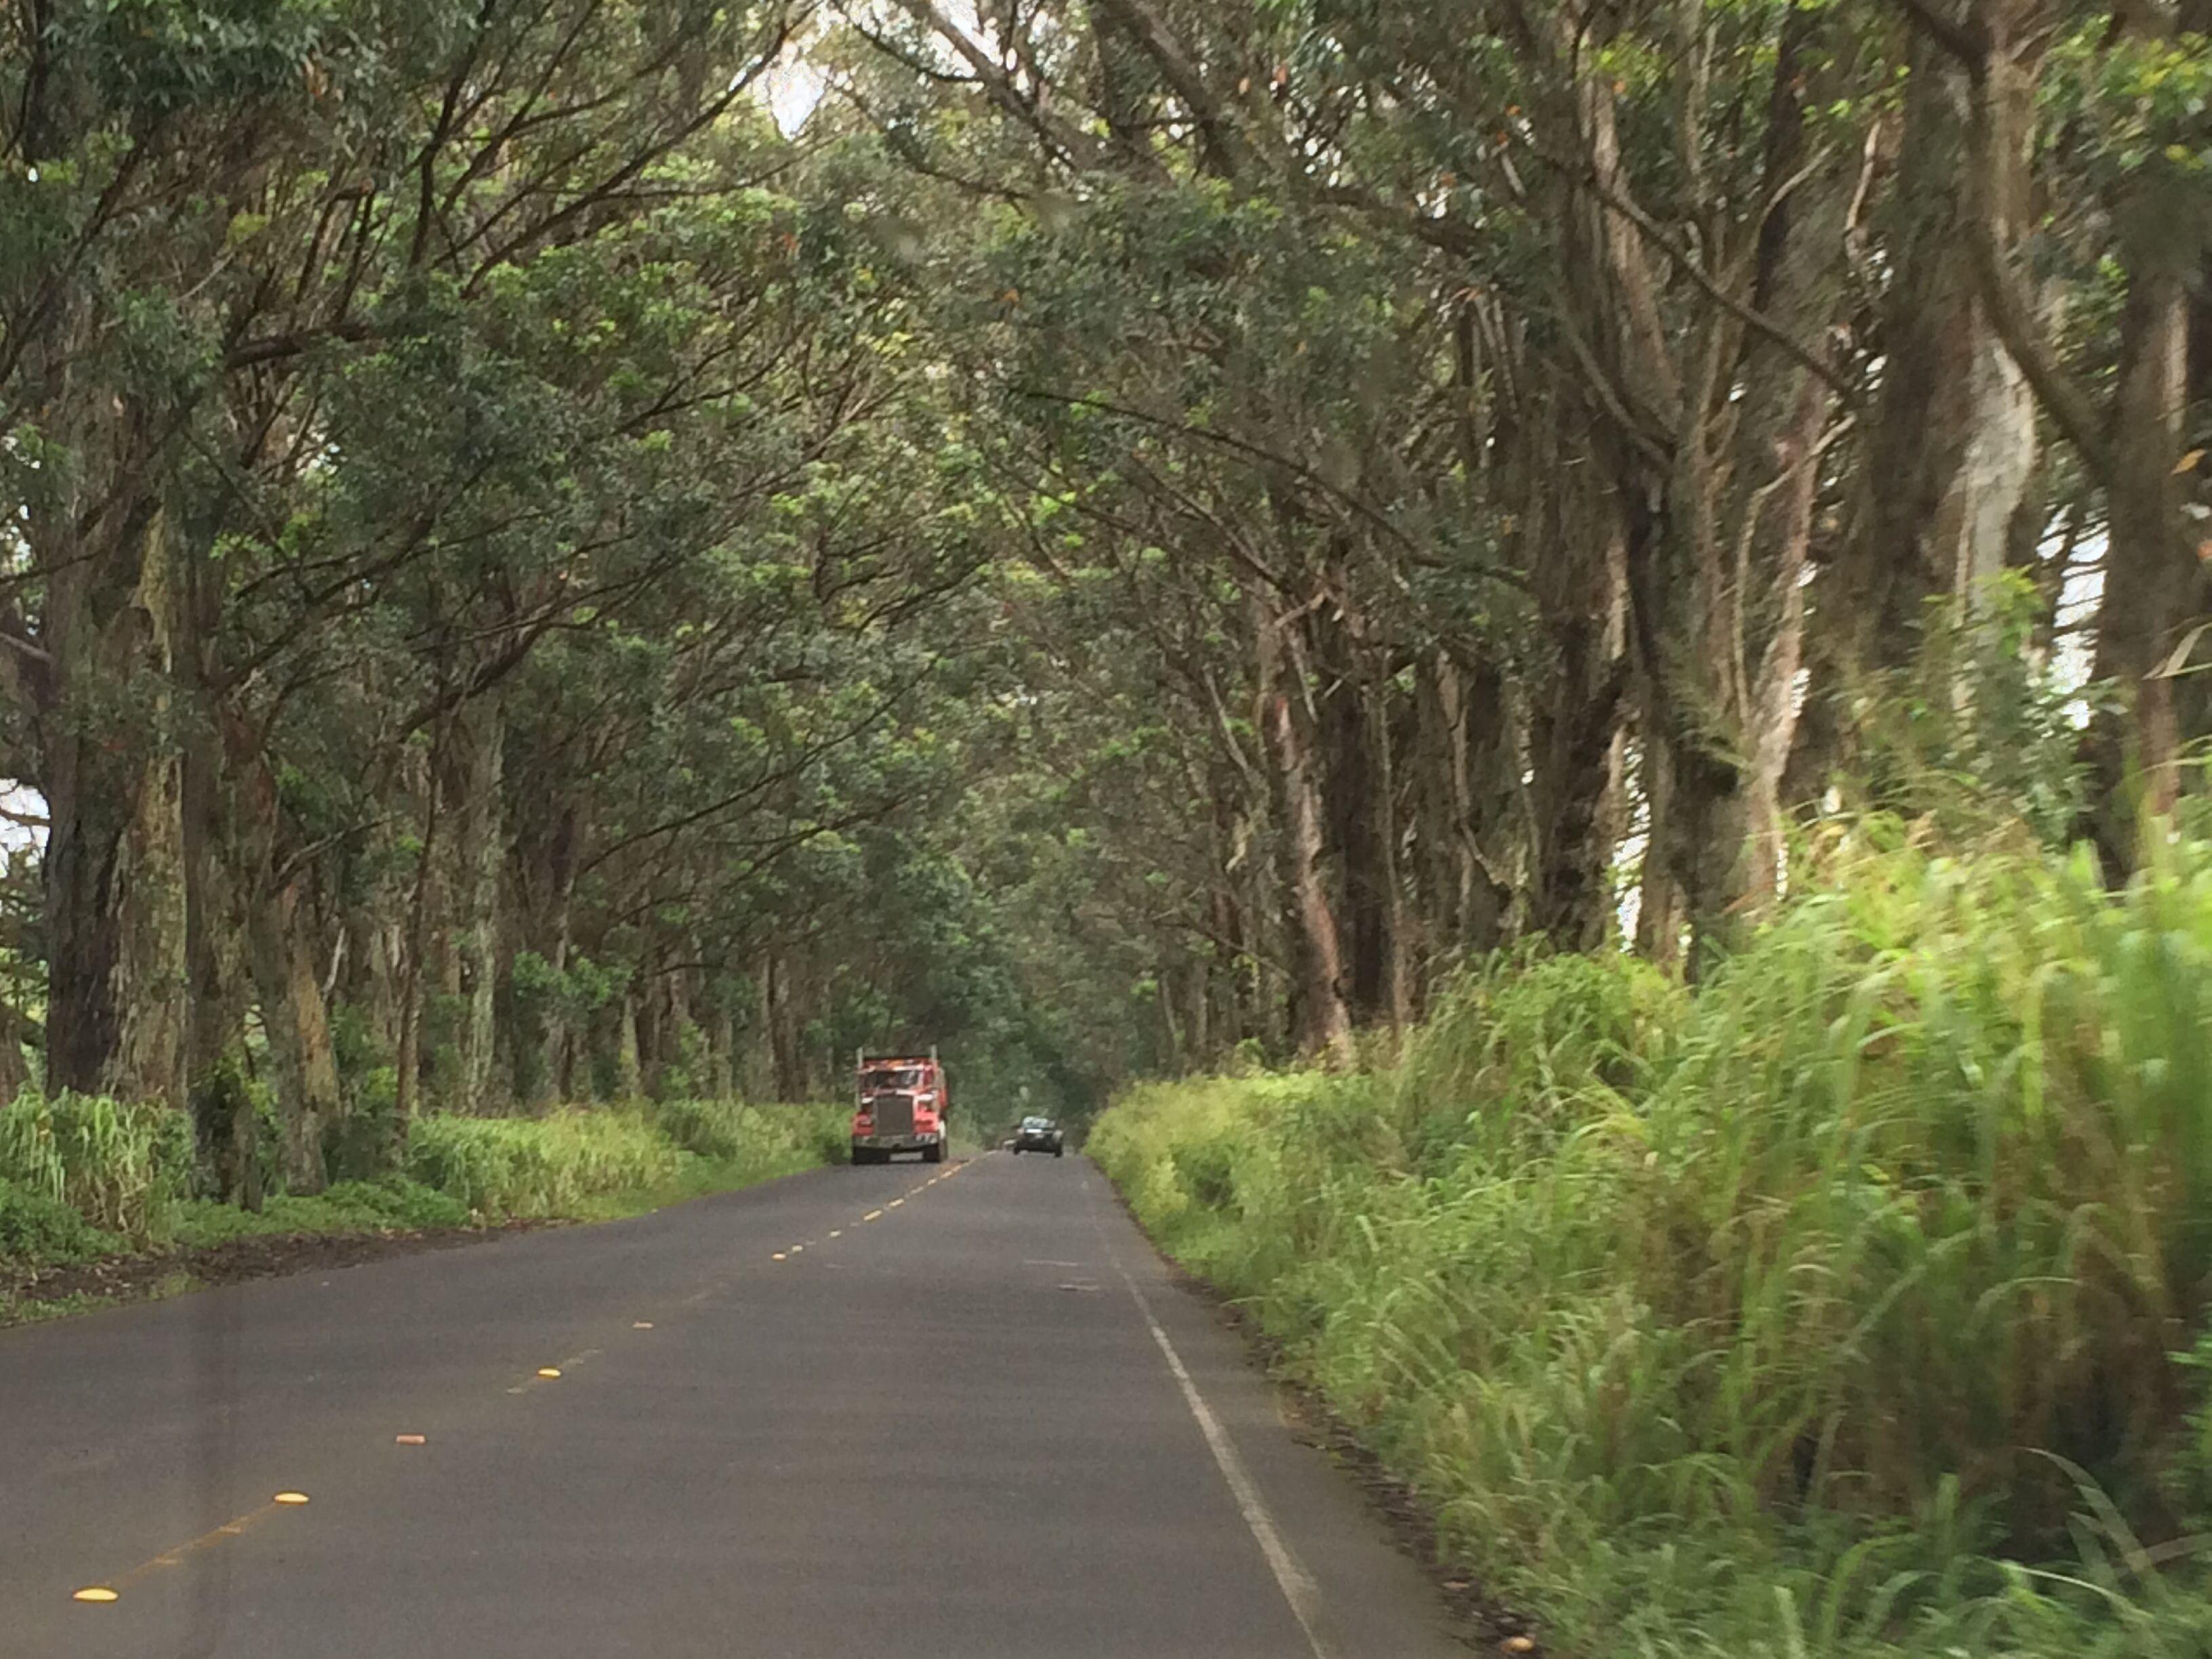 Tunnel of Trees, Kauai | Kauai 2014 | Pinterest